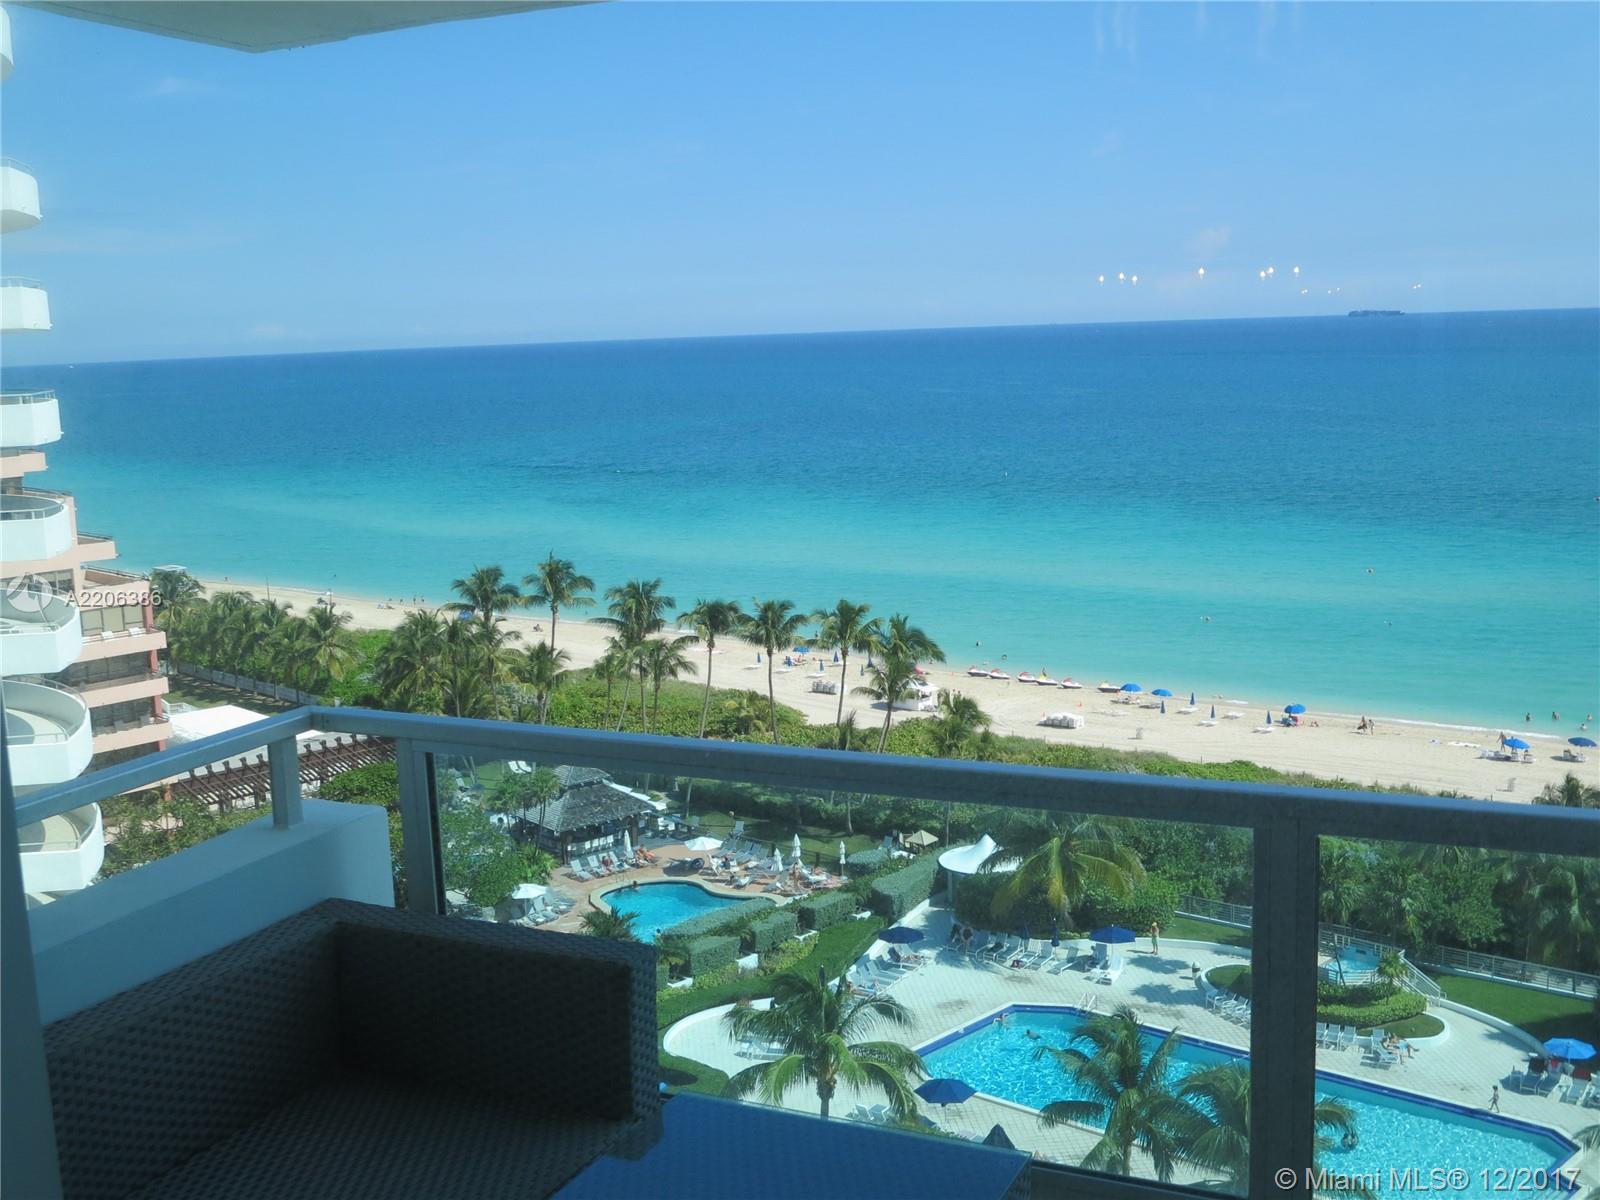 Seacoast 5151 #1519 - 5151 COLLINS AV #1519, Miami Beach, FL 33140